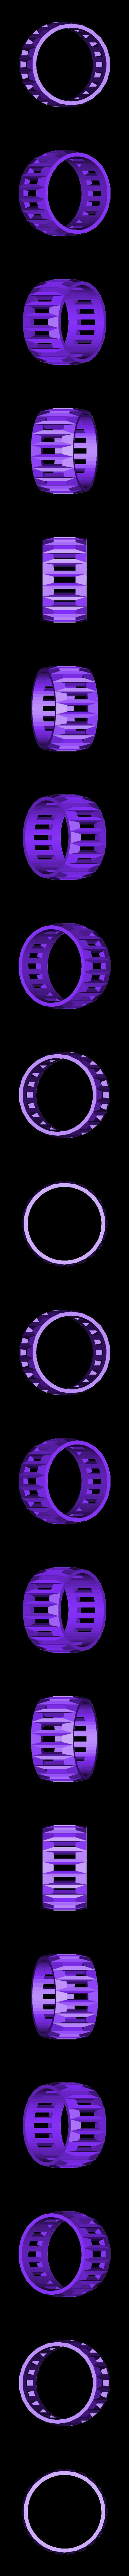 "08.stl Download free STL file the ""Bling Rings"" • 3D print model, leFabShop"